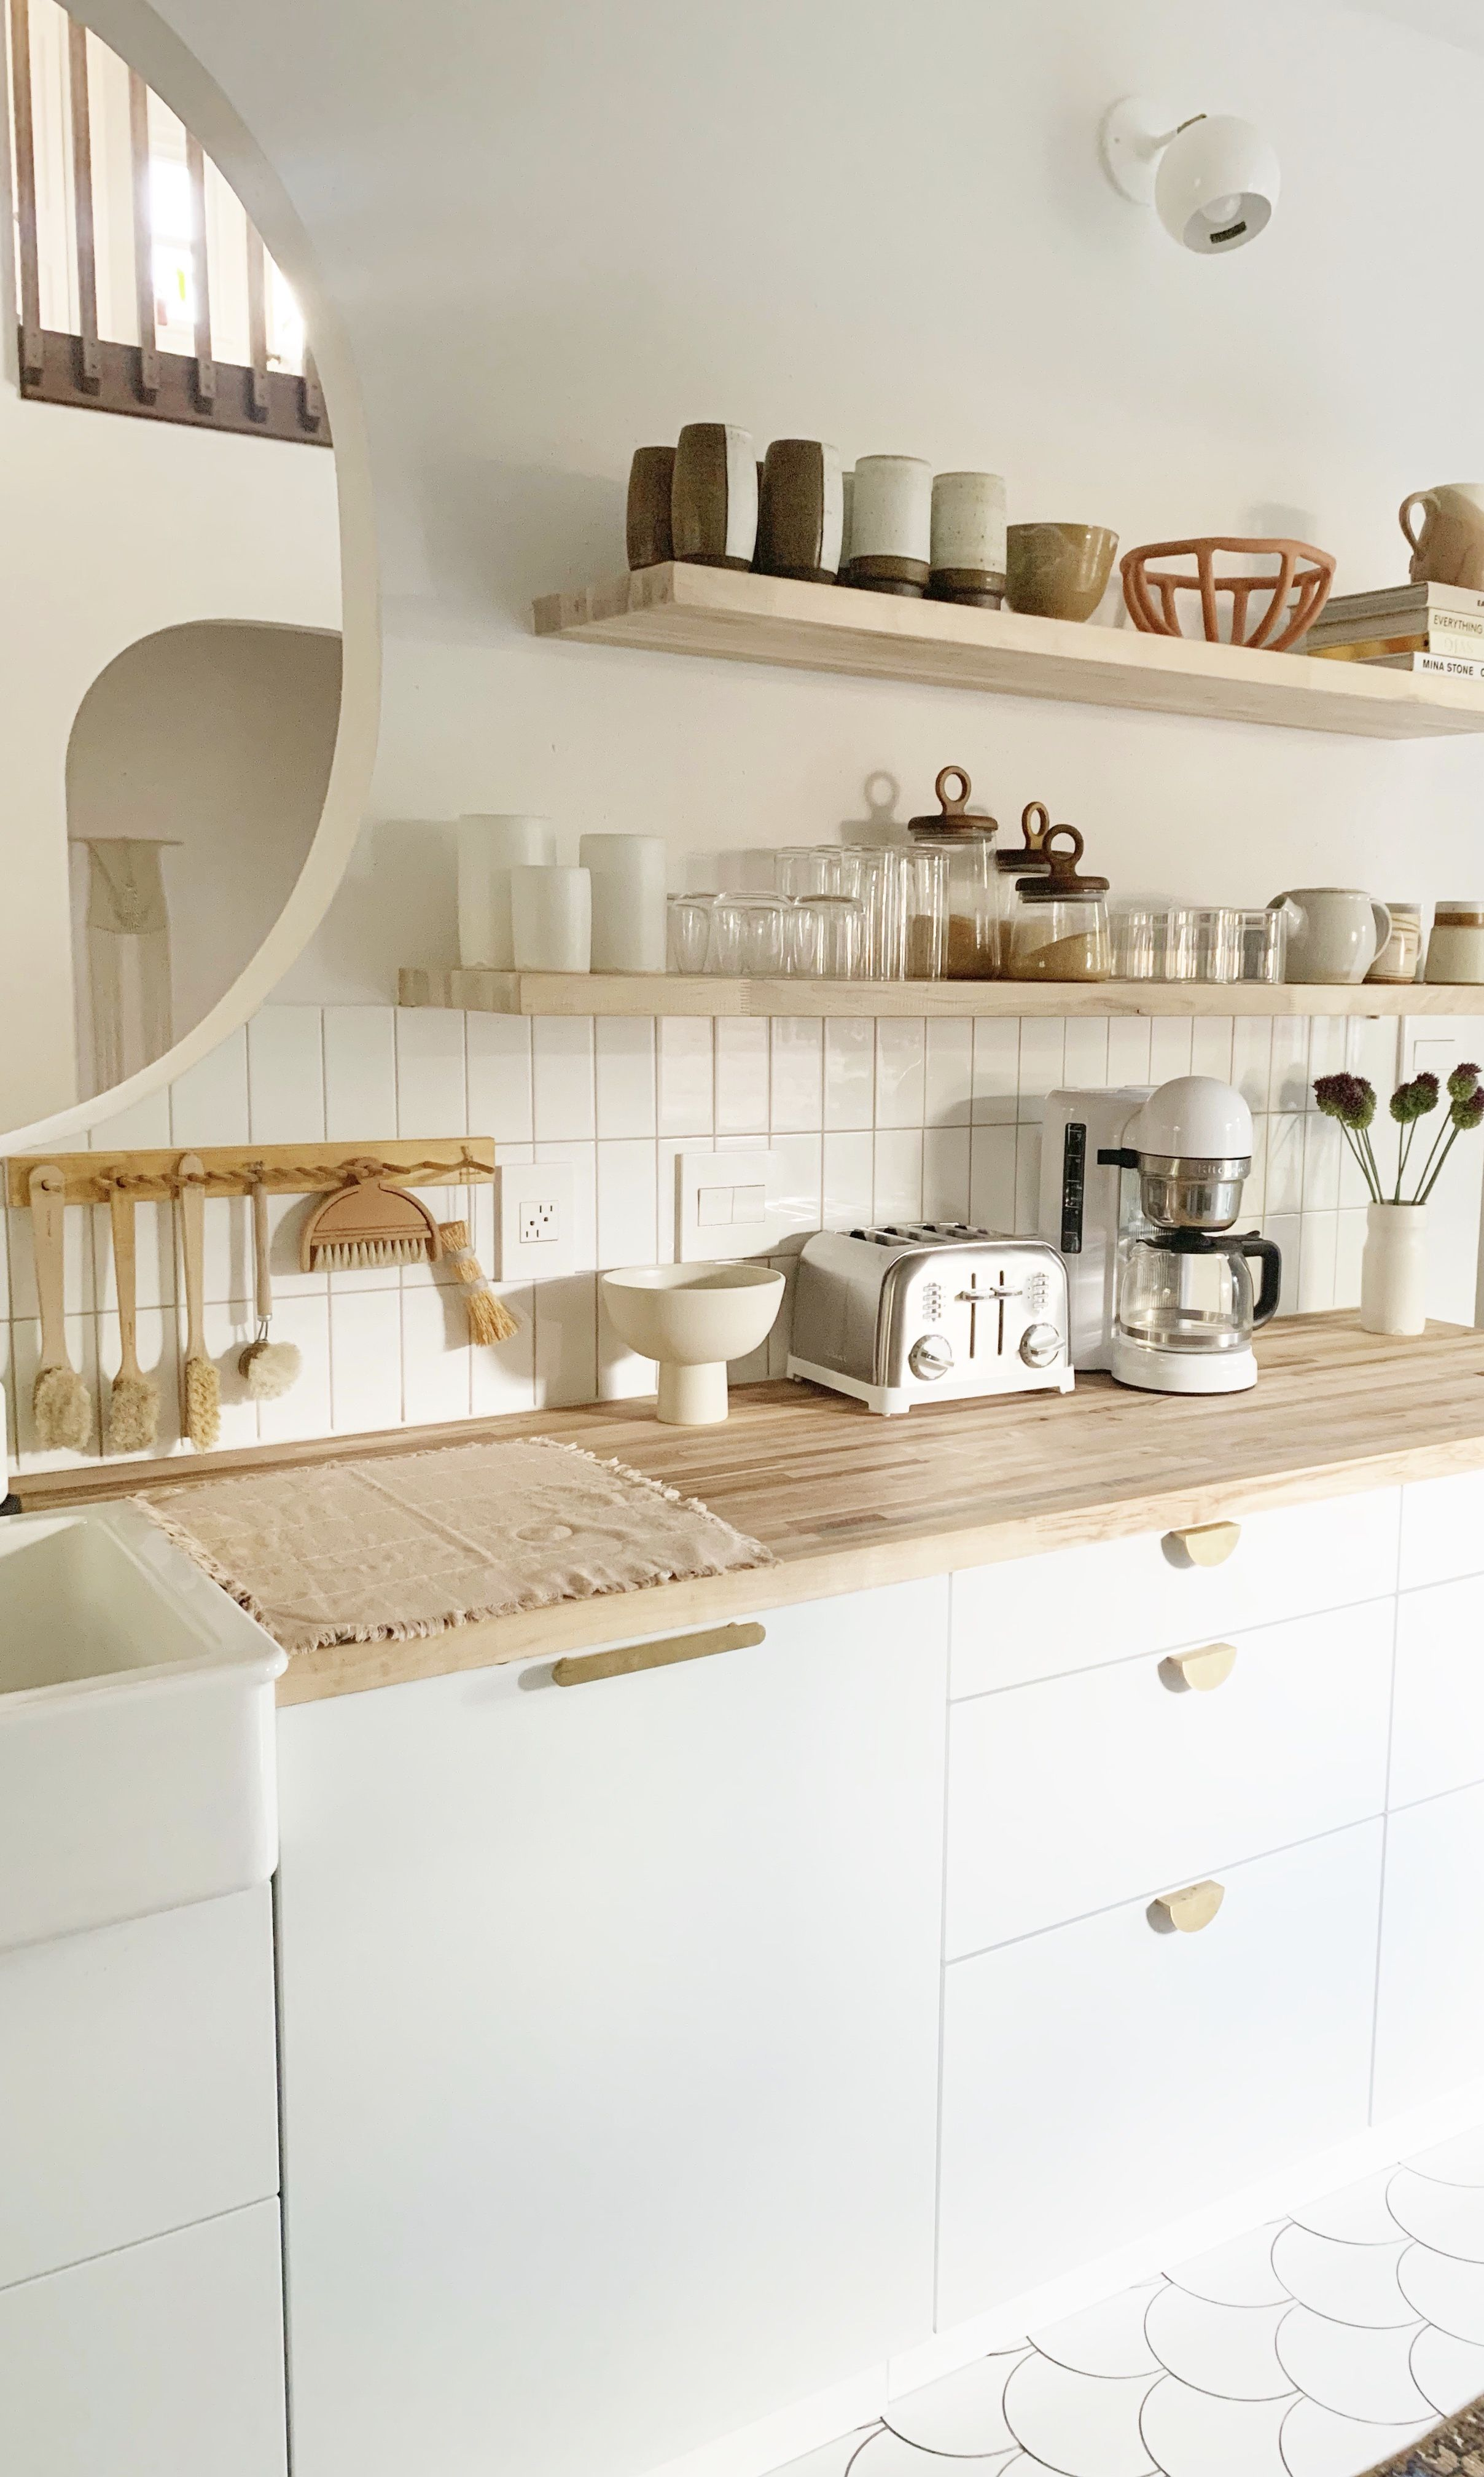 Modern, white kitchen, butcher block counter tops, open